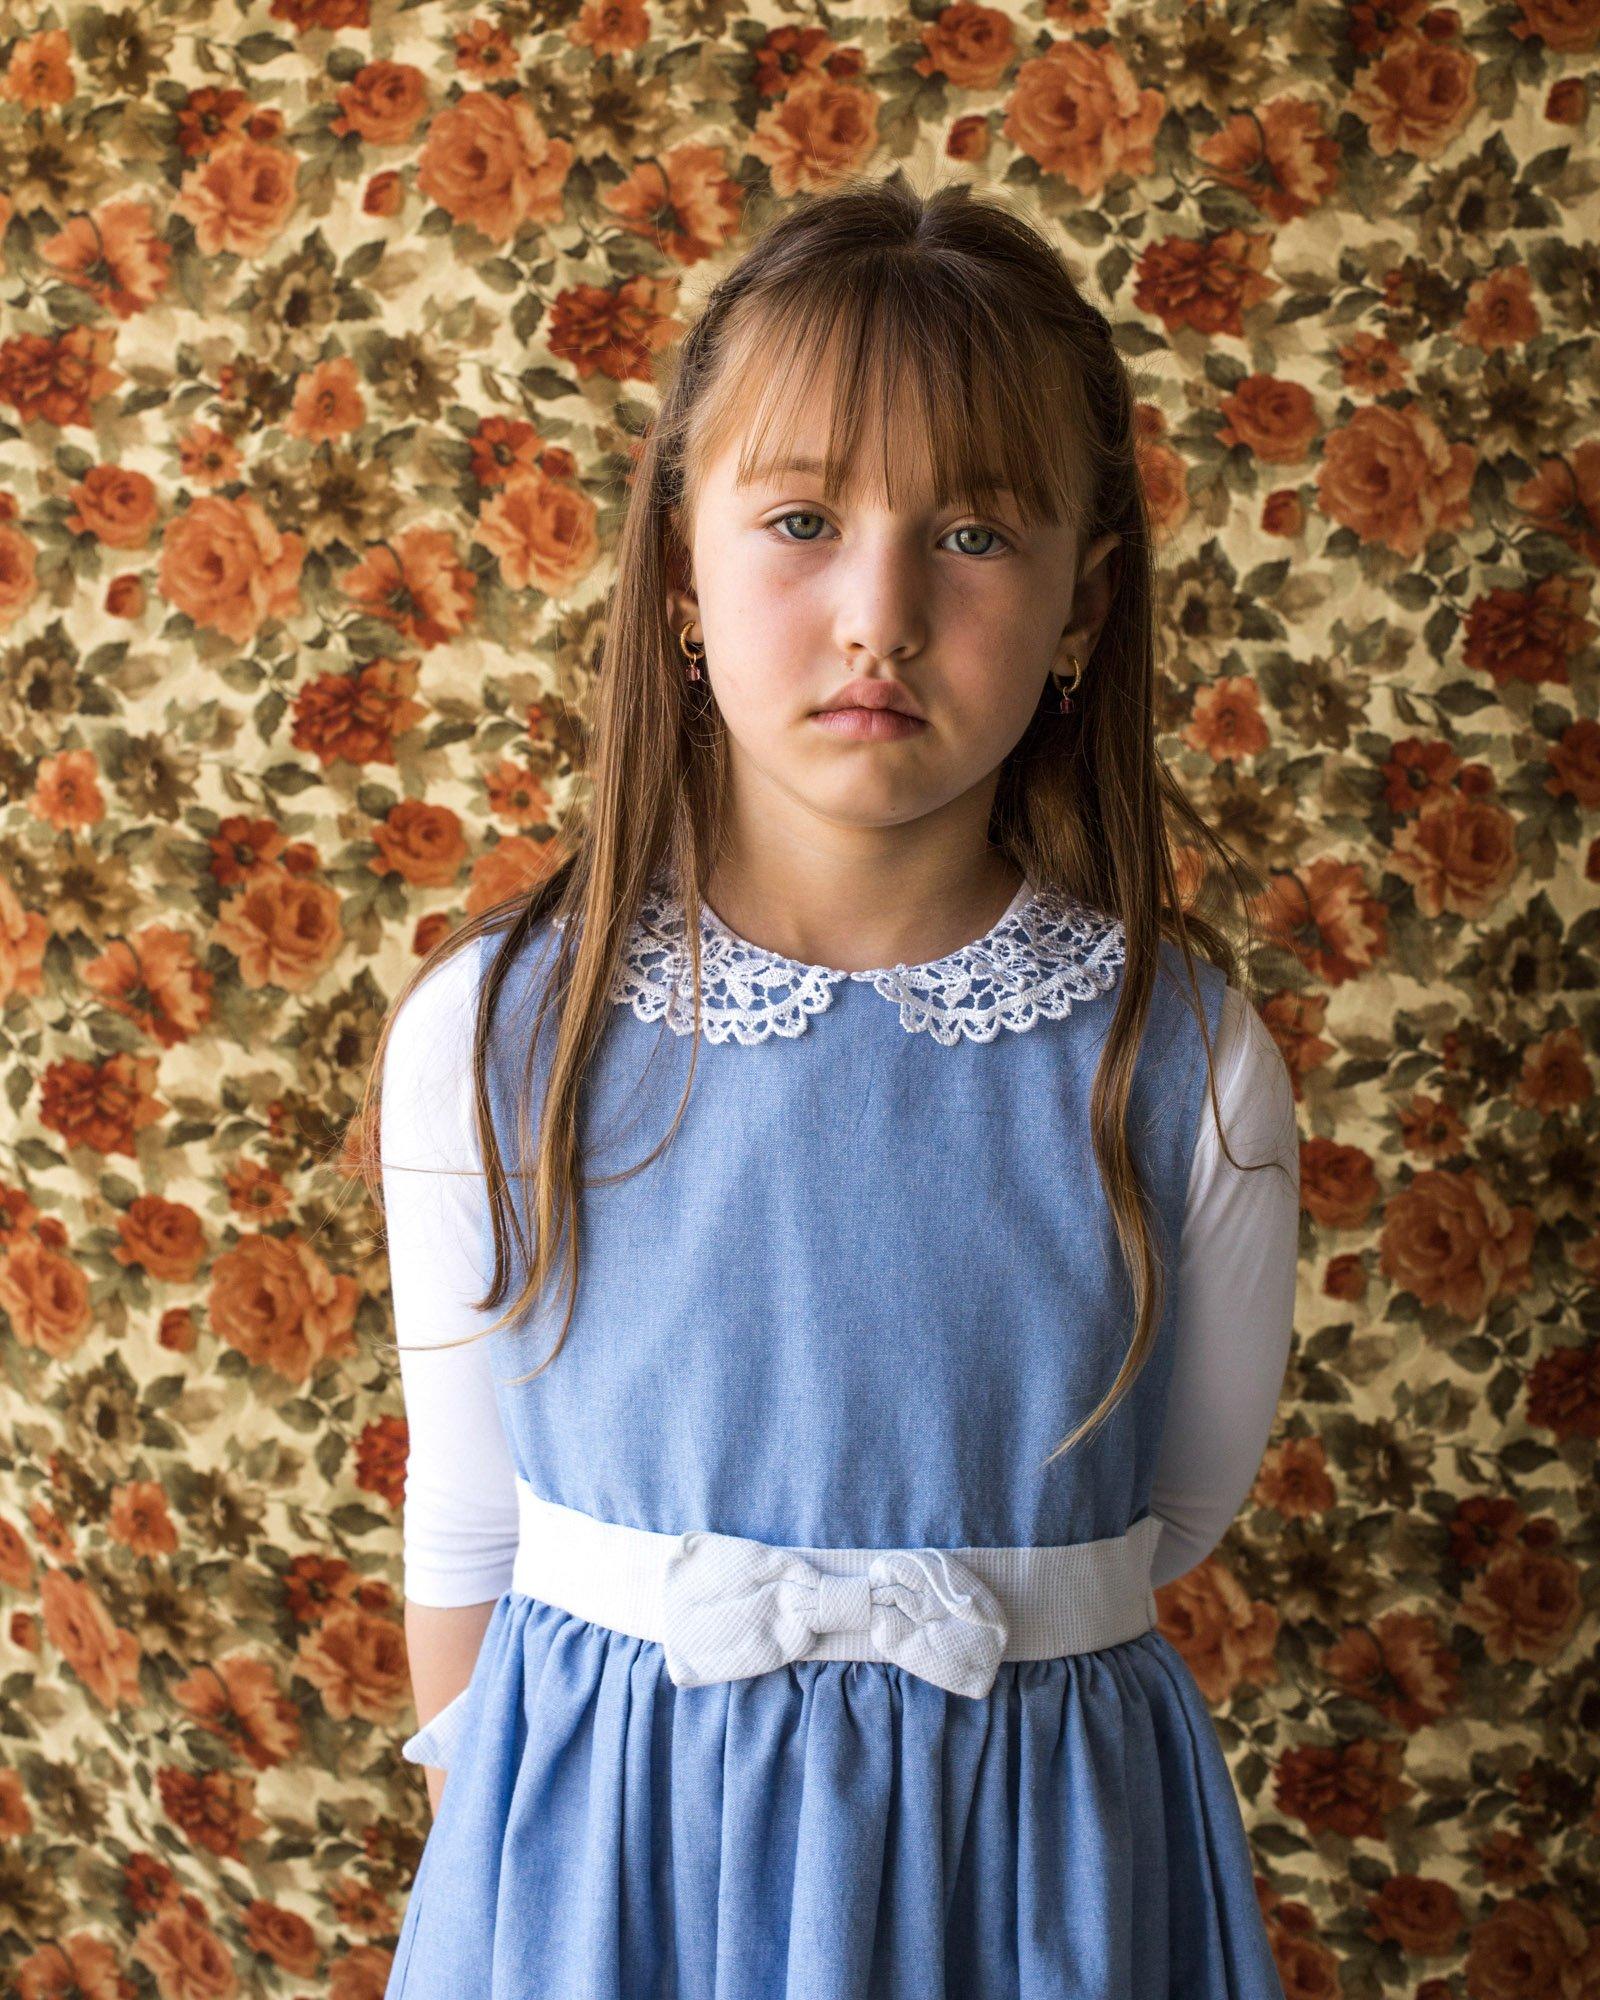 Portrait photograph of a young girl by Kovi Konowiecki